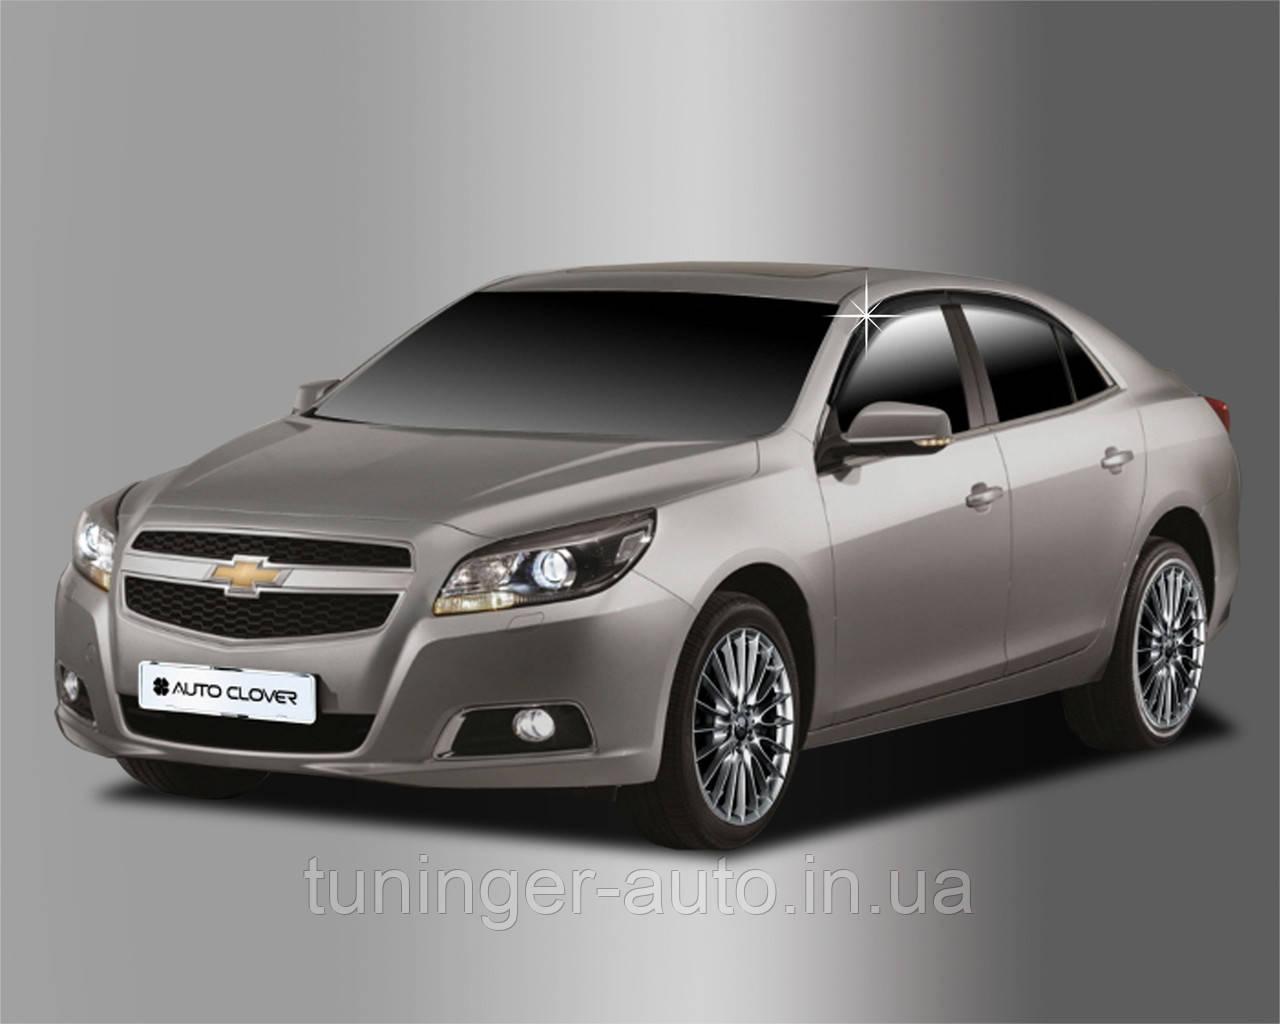 Ветровики, дефлекторы окон Chevrolet Malibu 2011-2015 A142